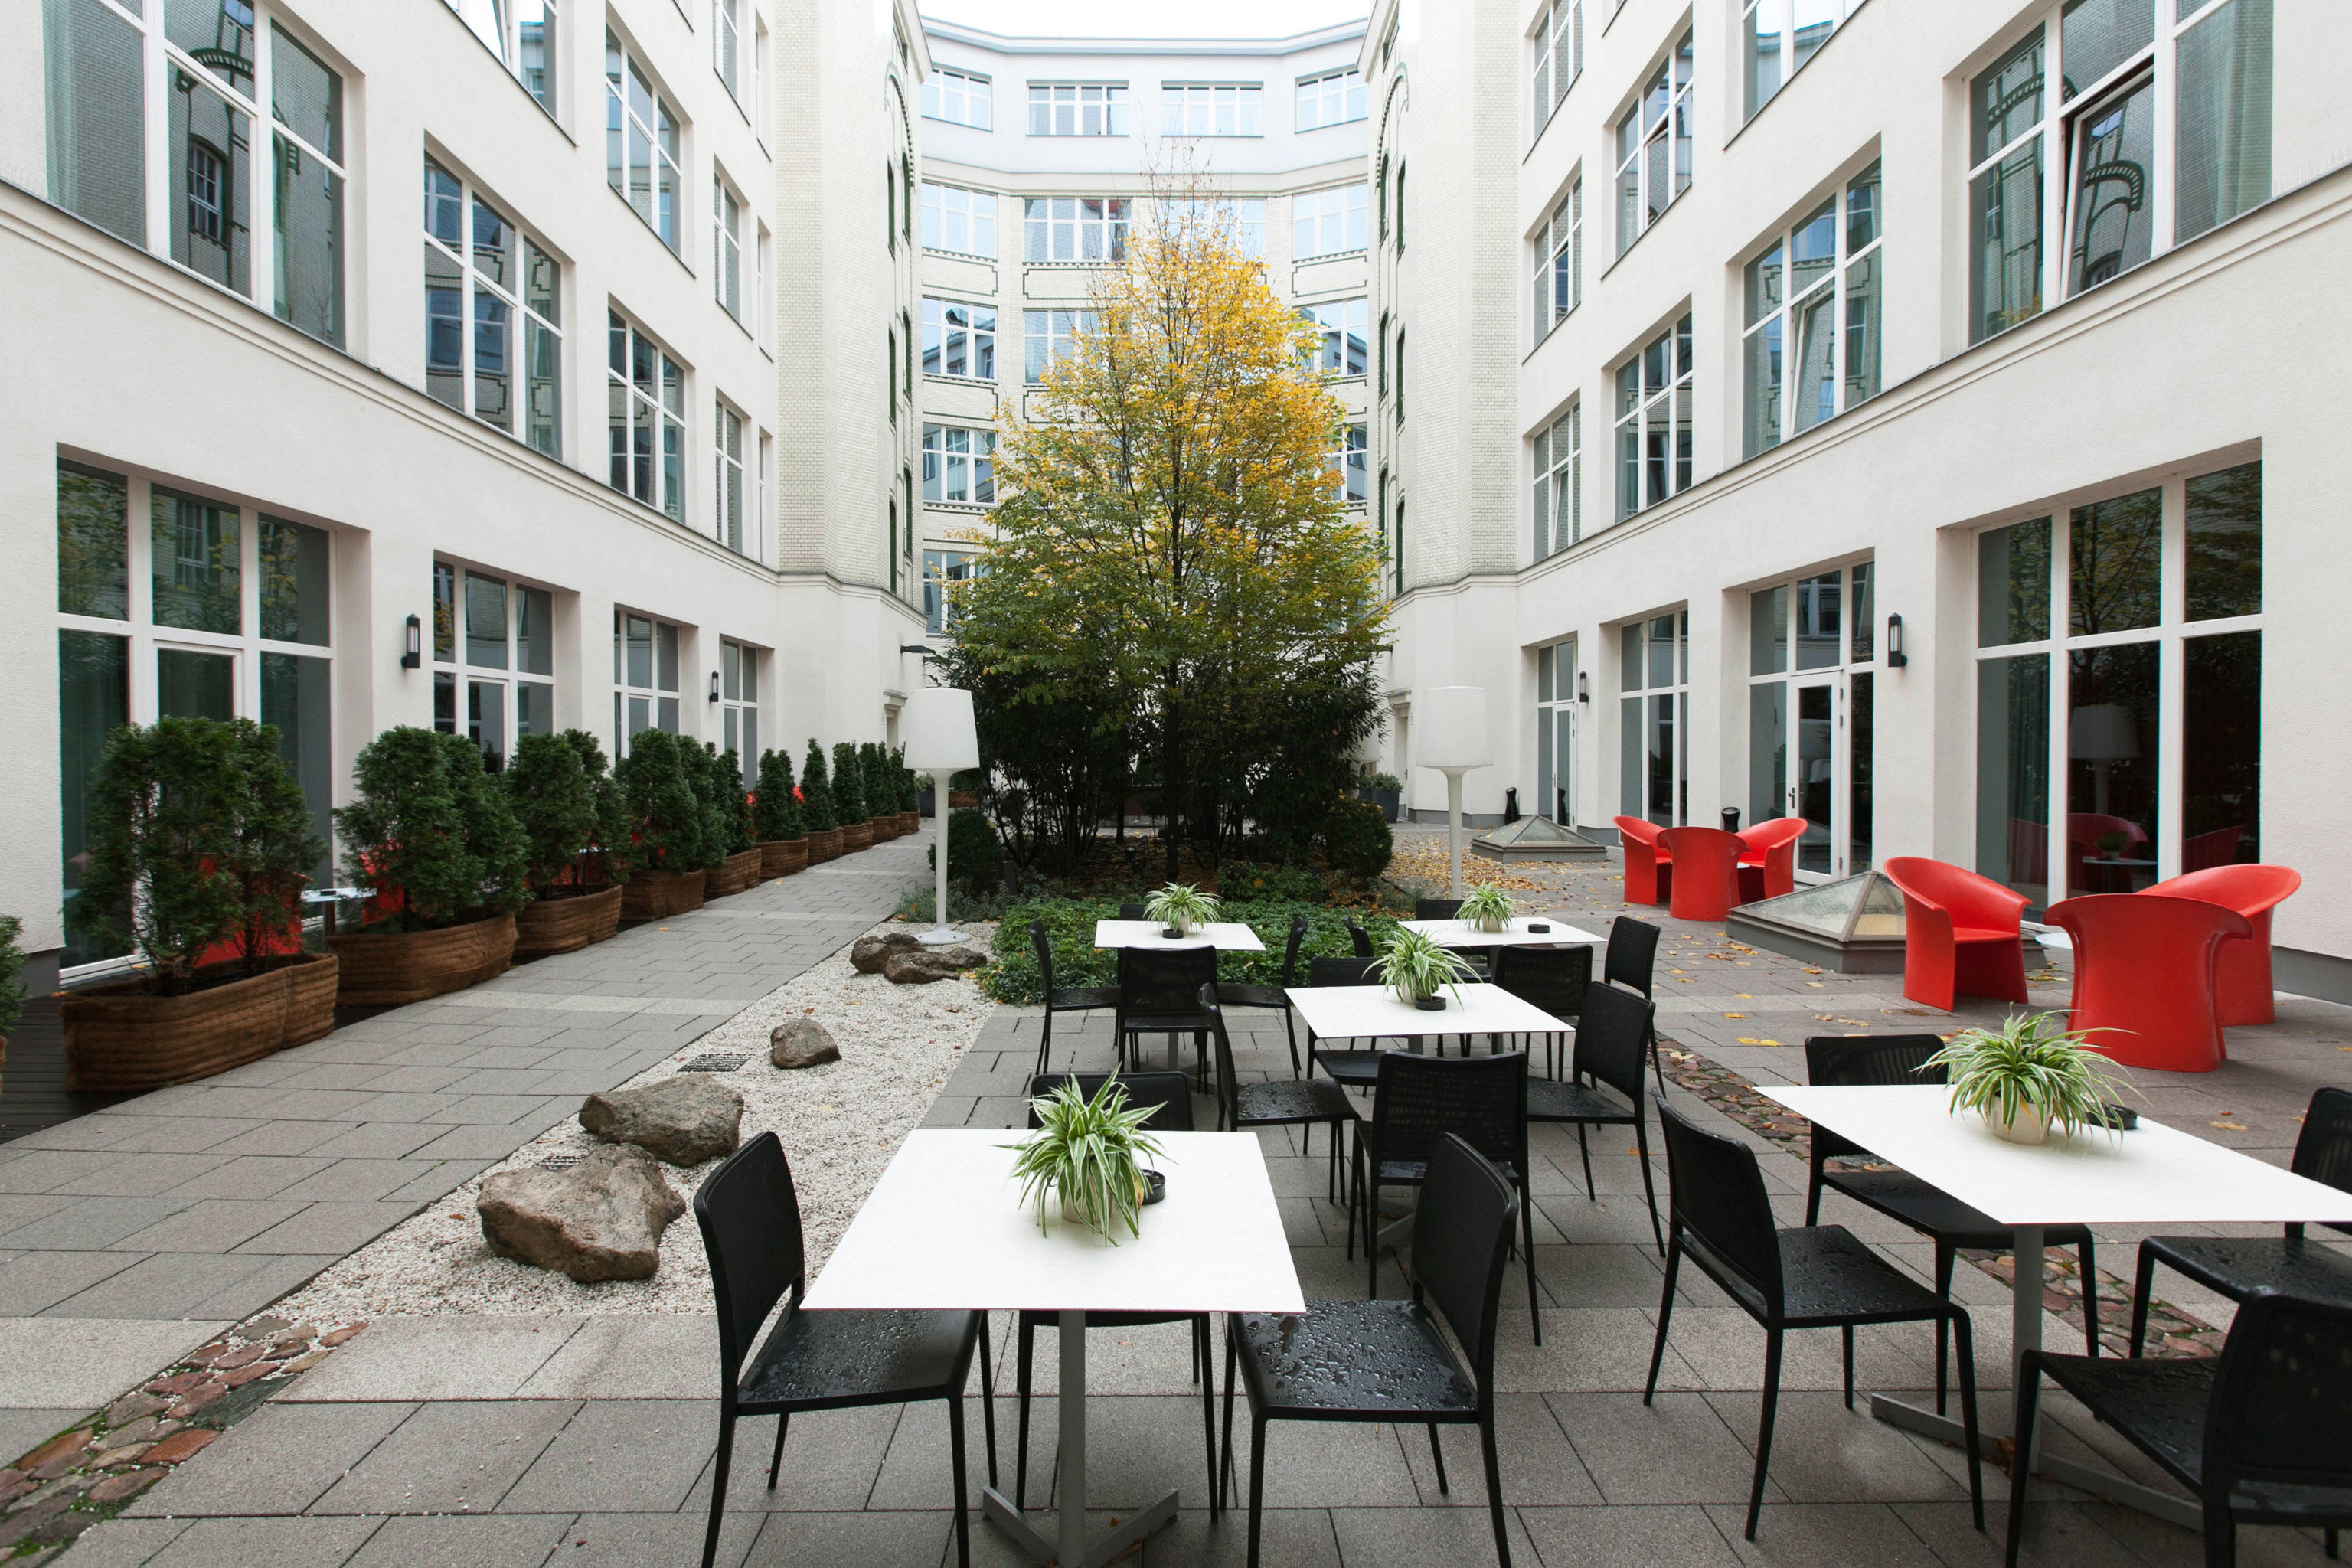 building property condominium Courtyard plaza restaurant